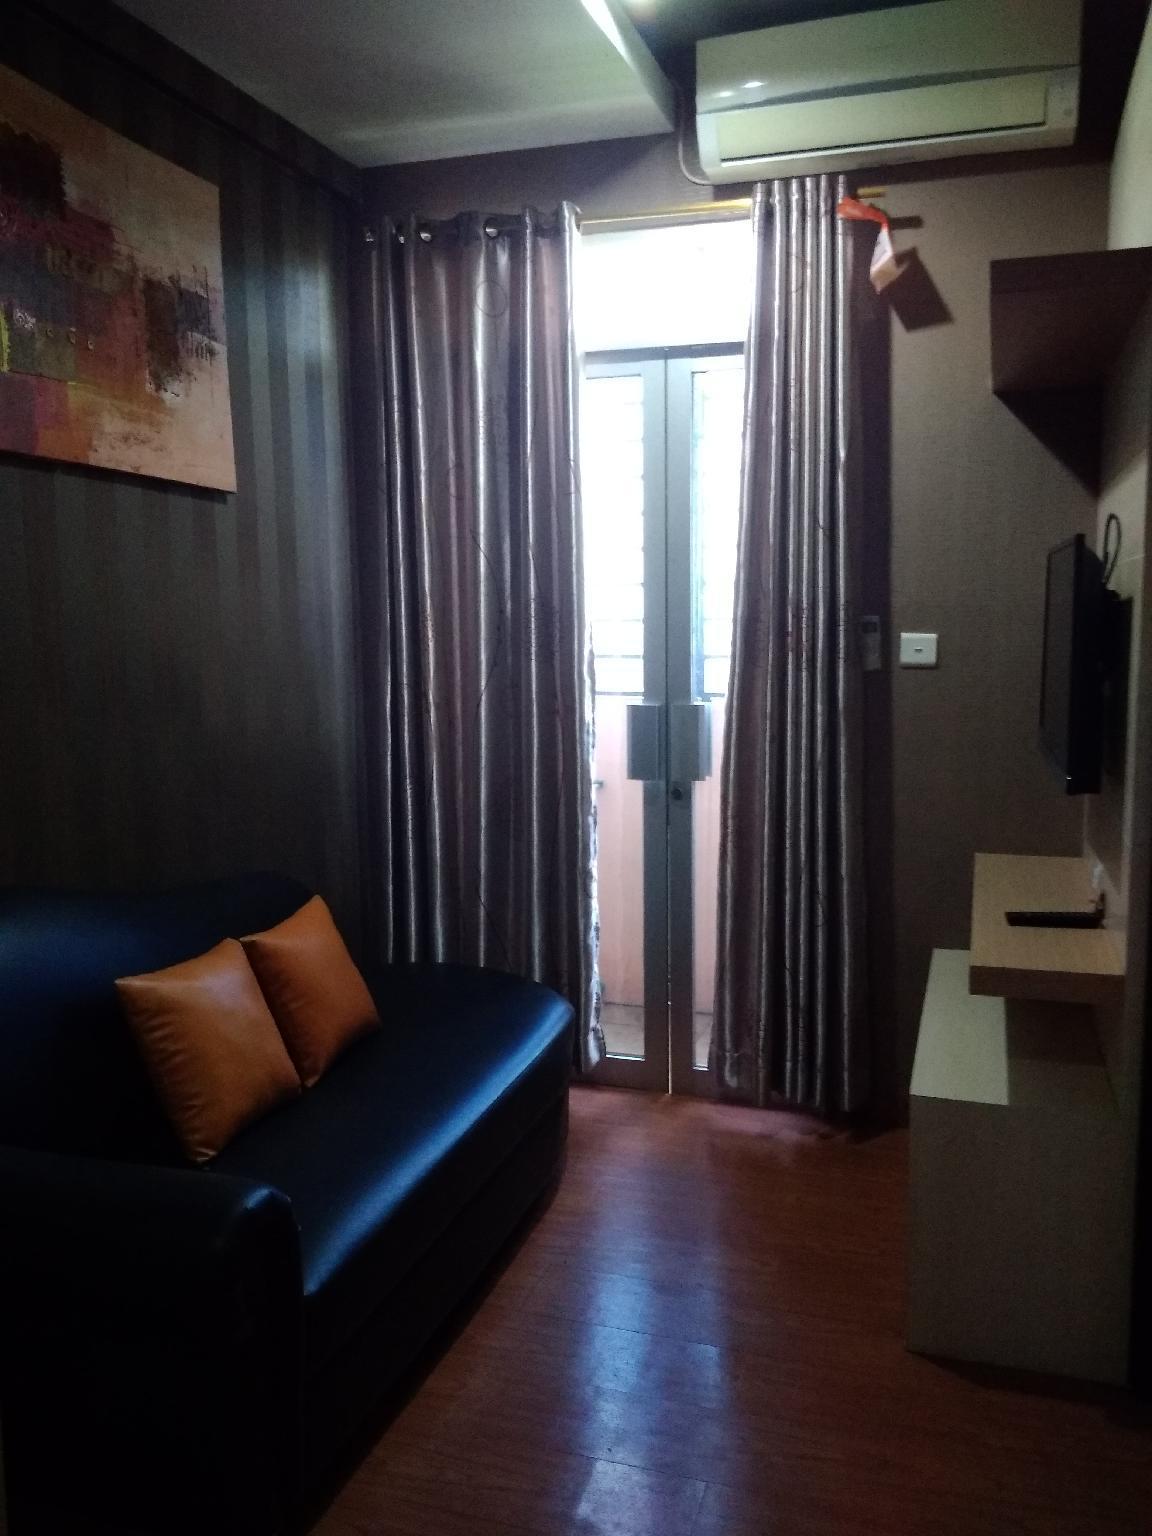 Apartemen Bandung Cimahi By Maulina